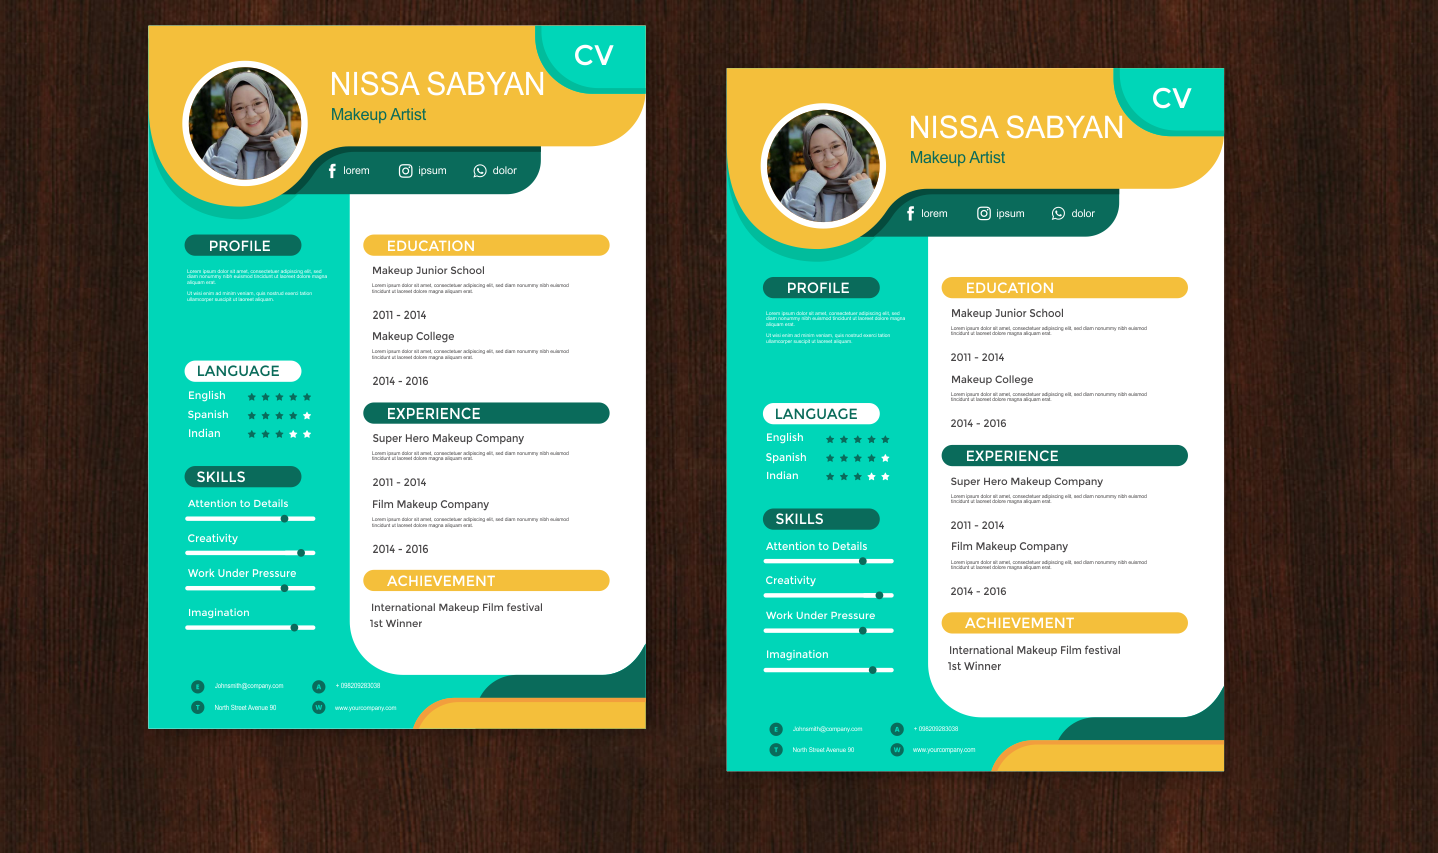 Download Template CV CorelDRAW Keren Abis 2018 - Master